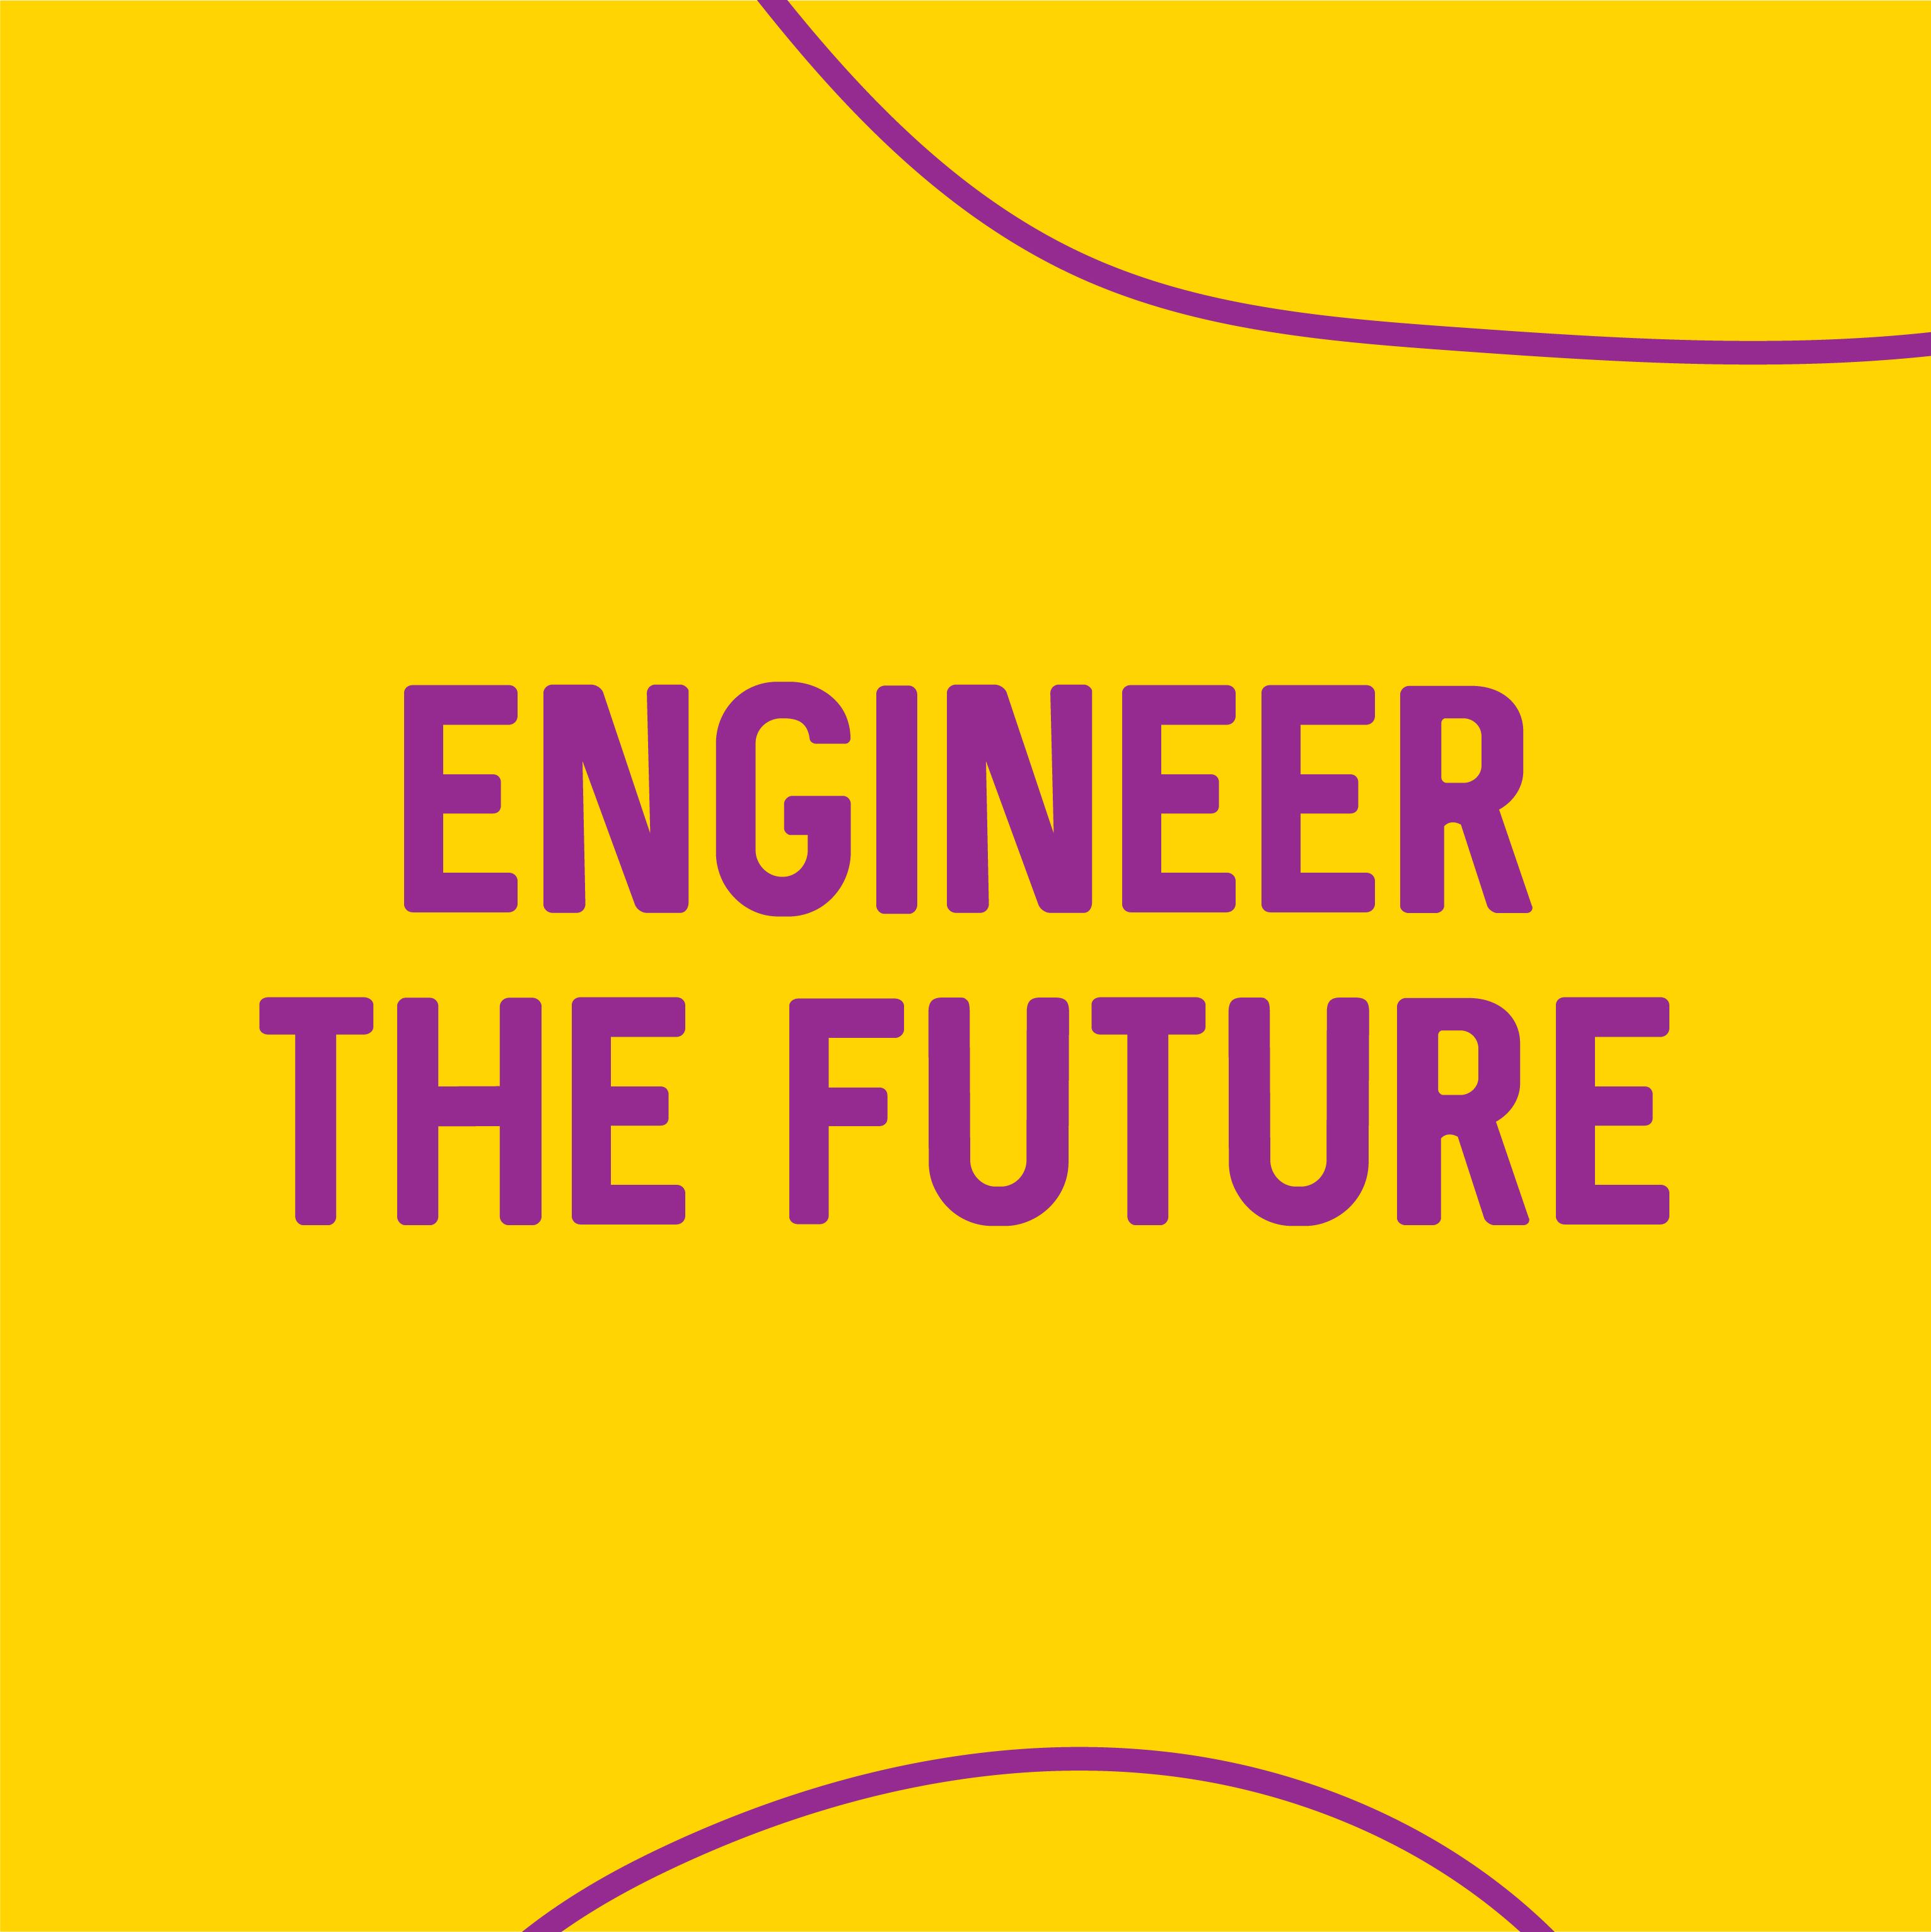 Engineer the Future